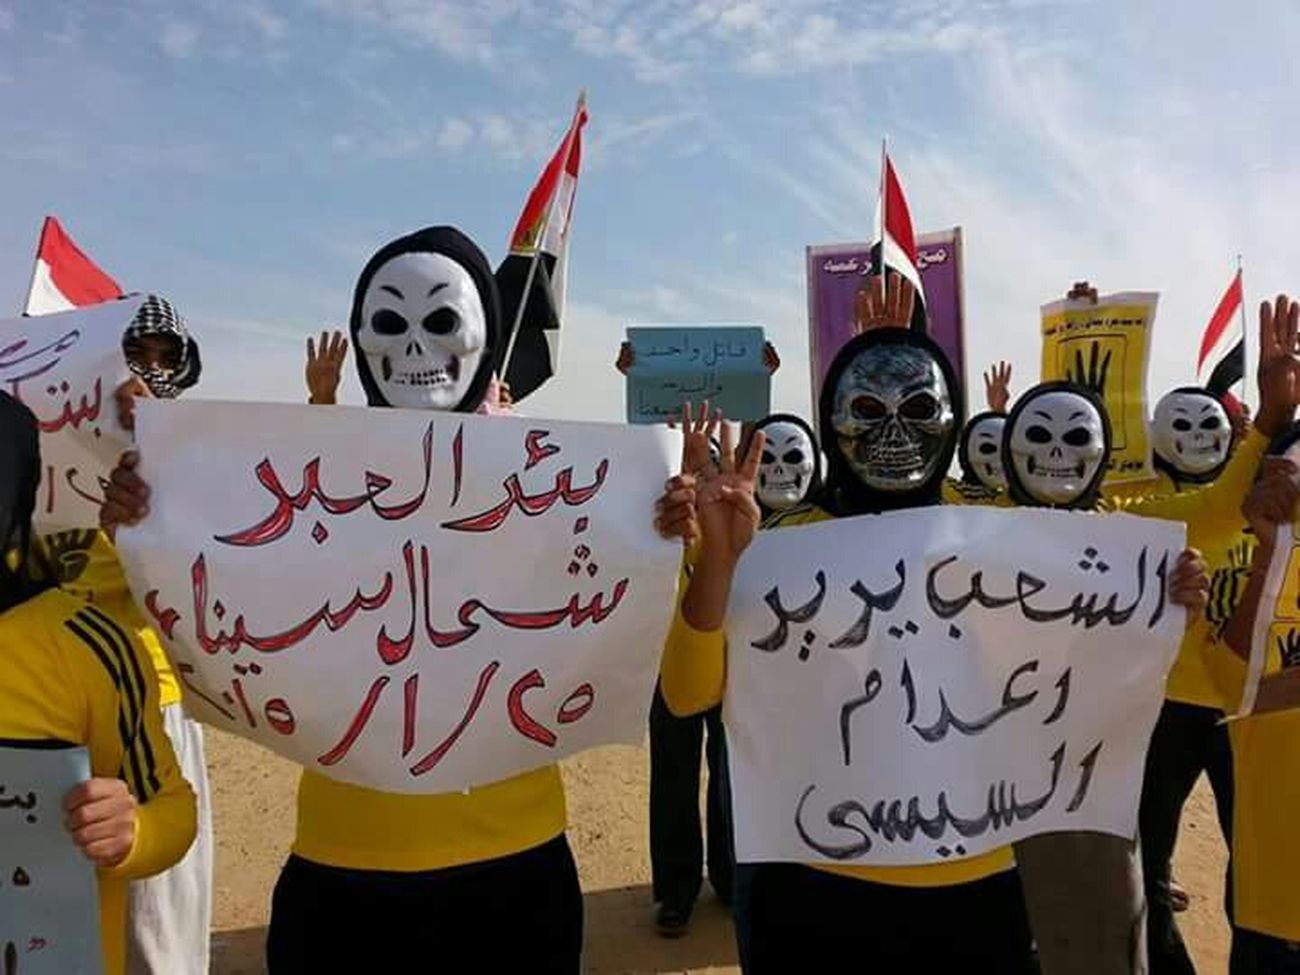 Revolution Egypt 25jan ثورة 25 يناير مصر